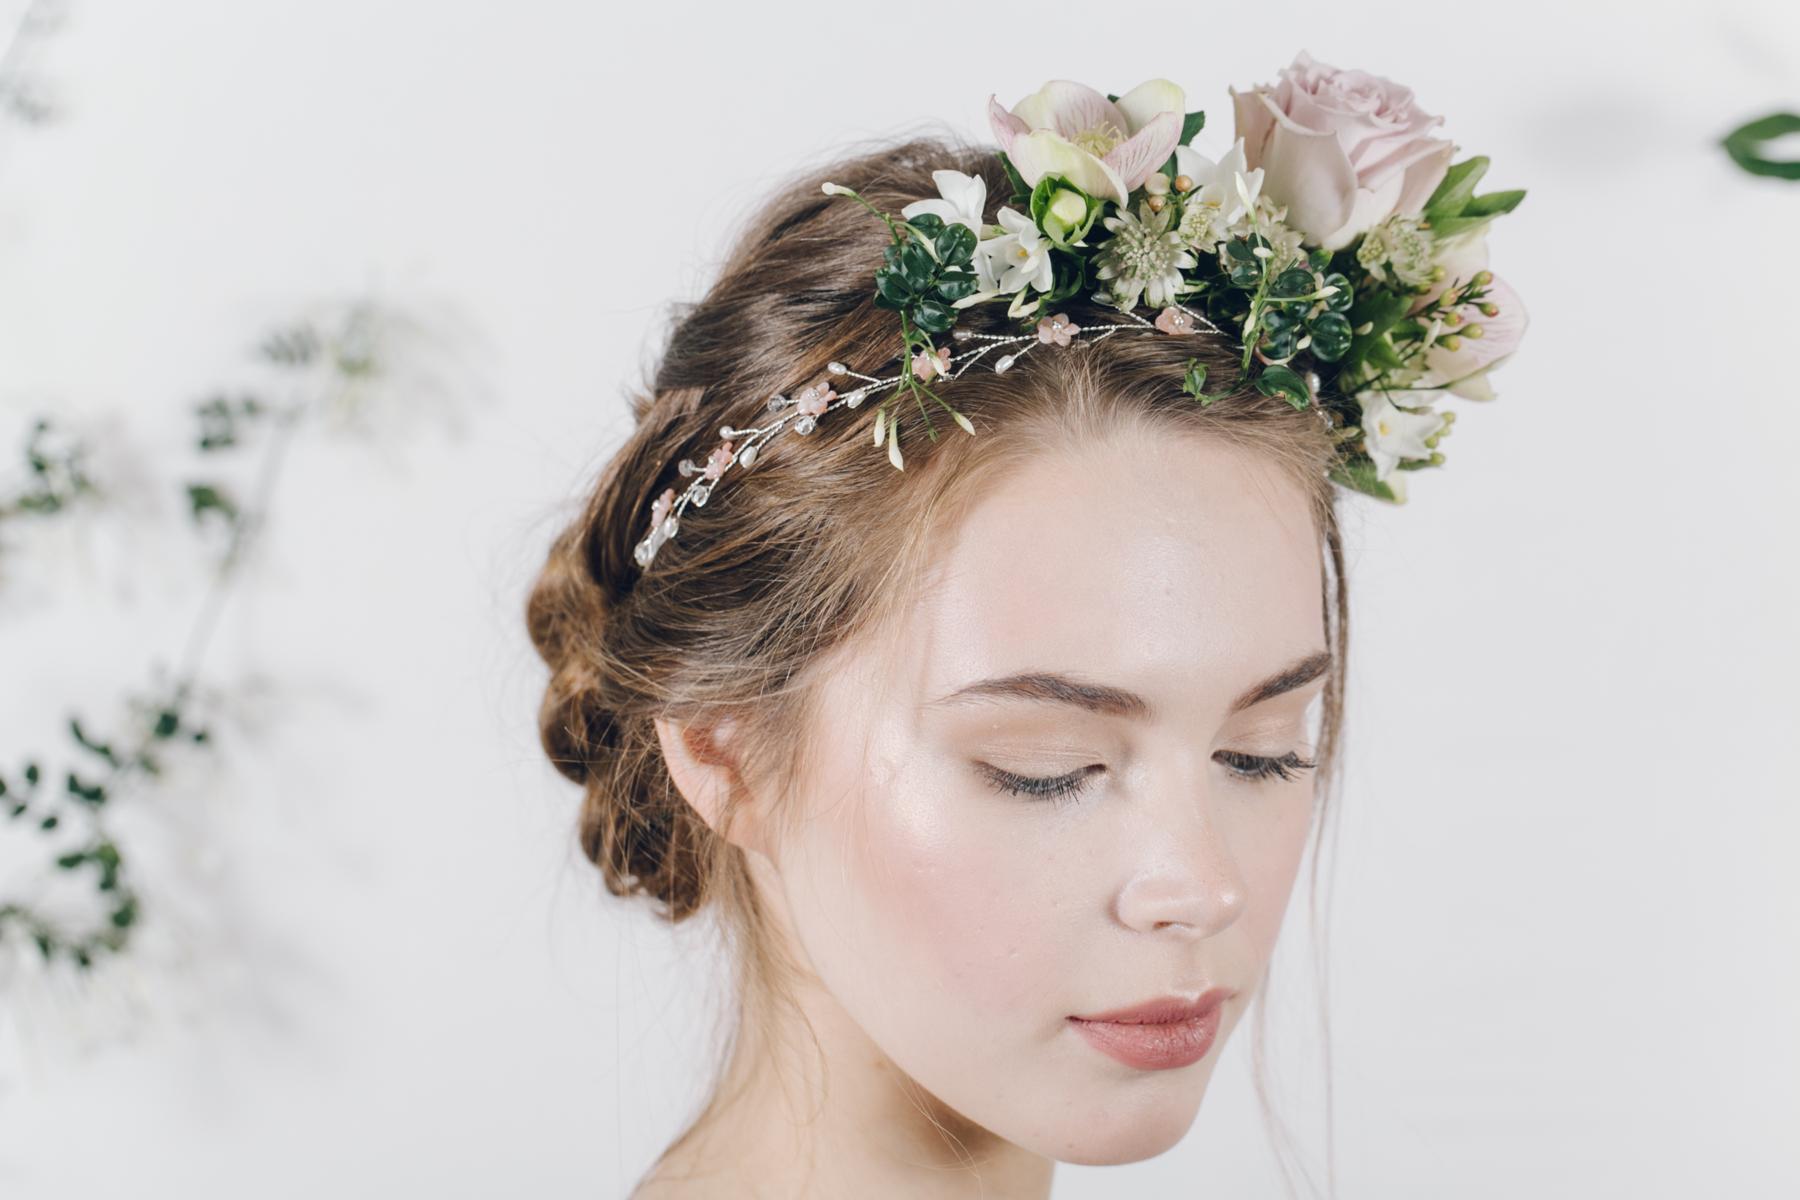 awards finalist unveils new hair accessories - bridal buyer home